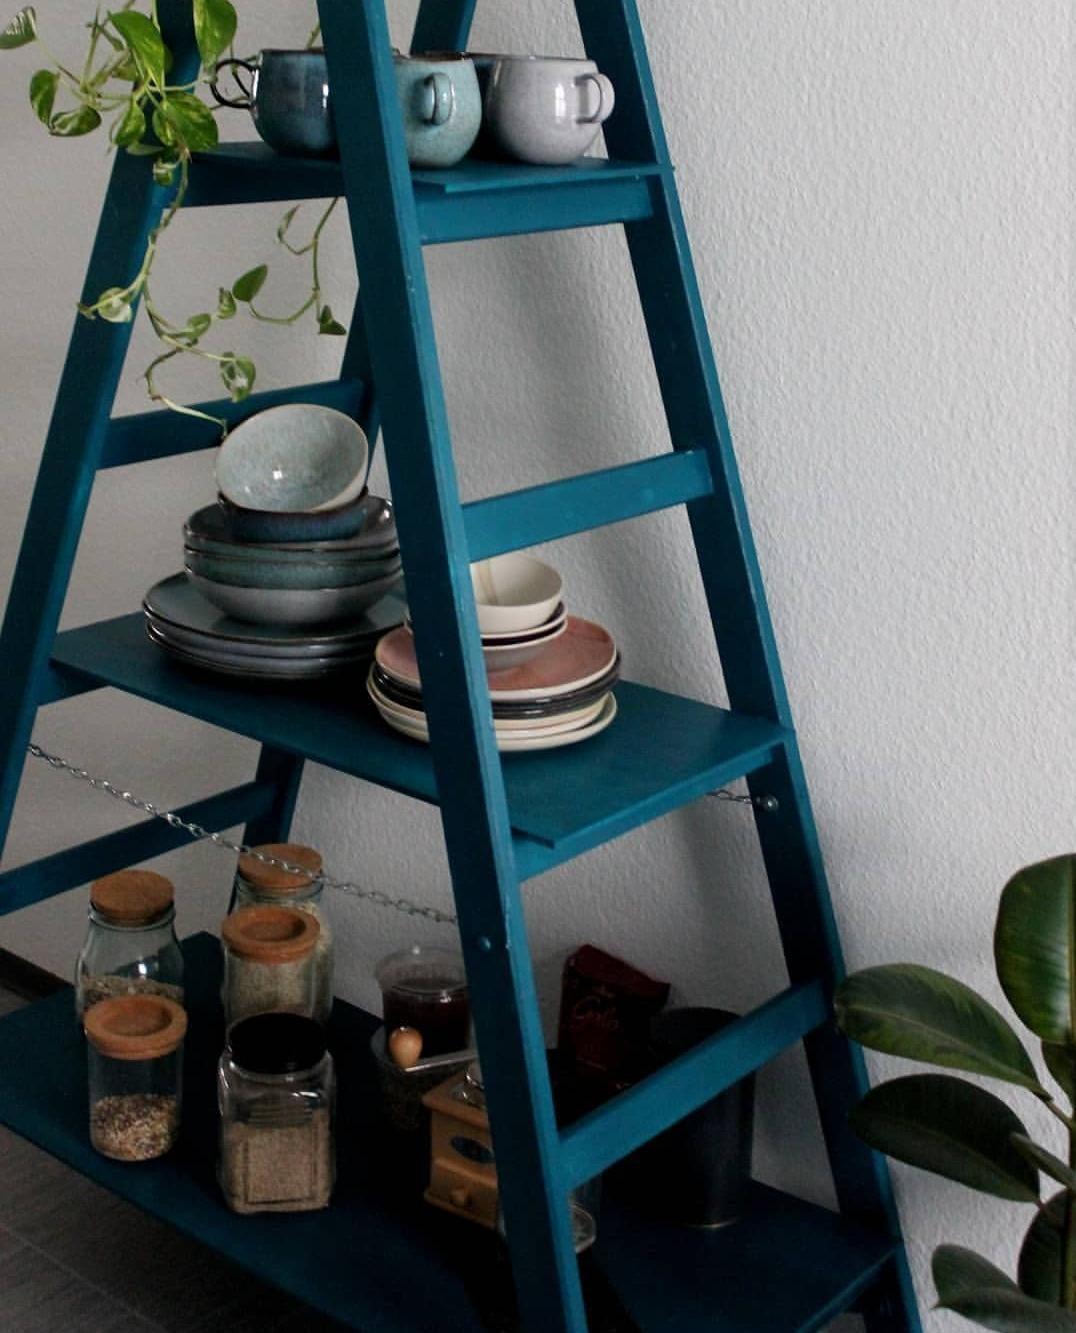 Küche Petrol | Petrol Diyweek Diyregal Diy Kuche Skandinavisc